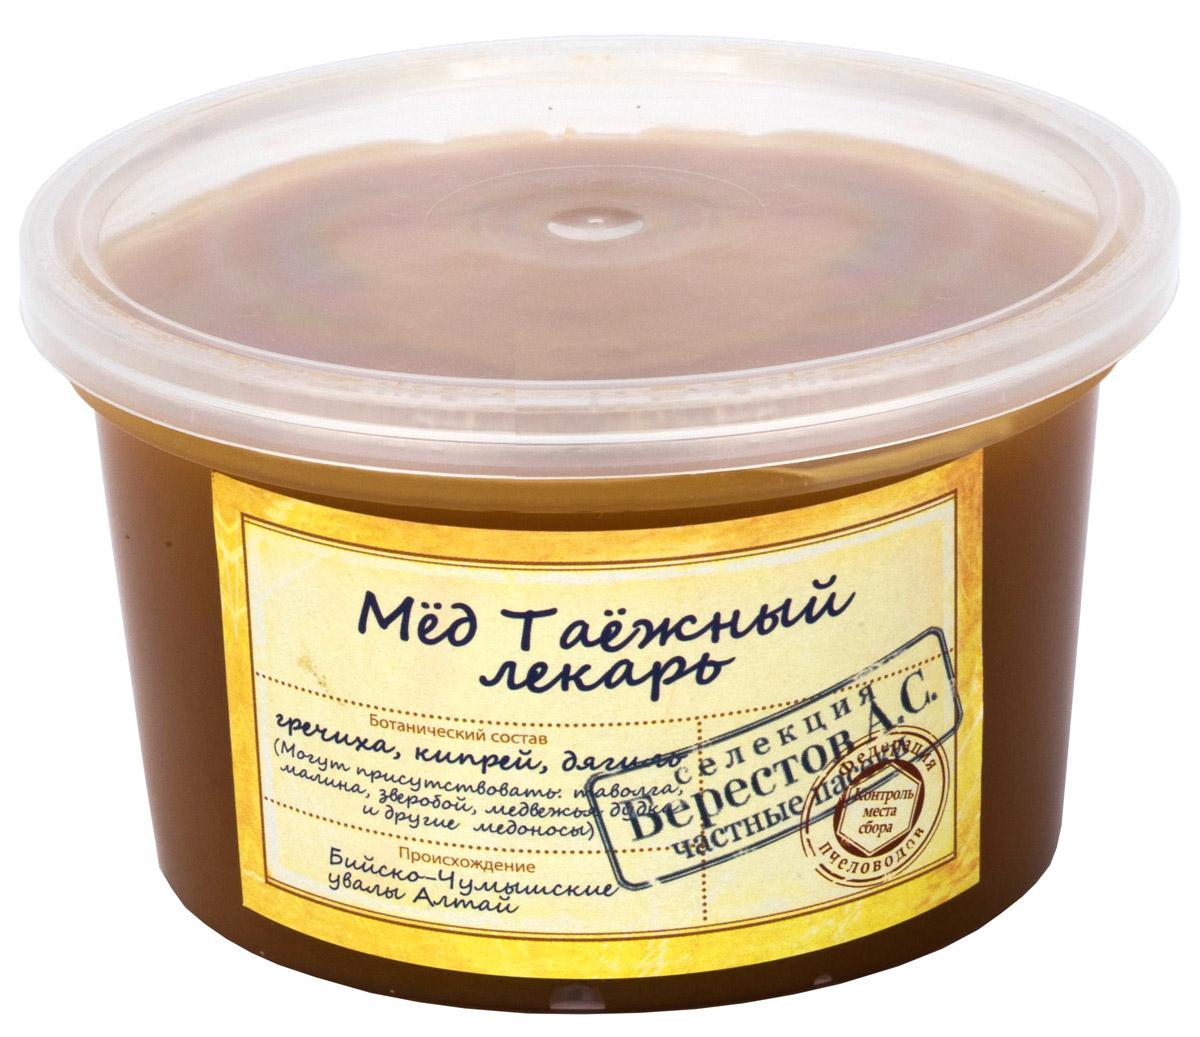 Honey Berestoff A.S.